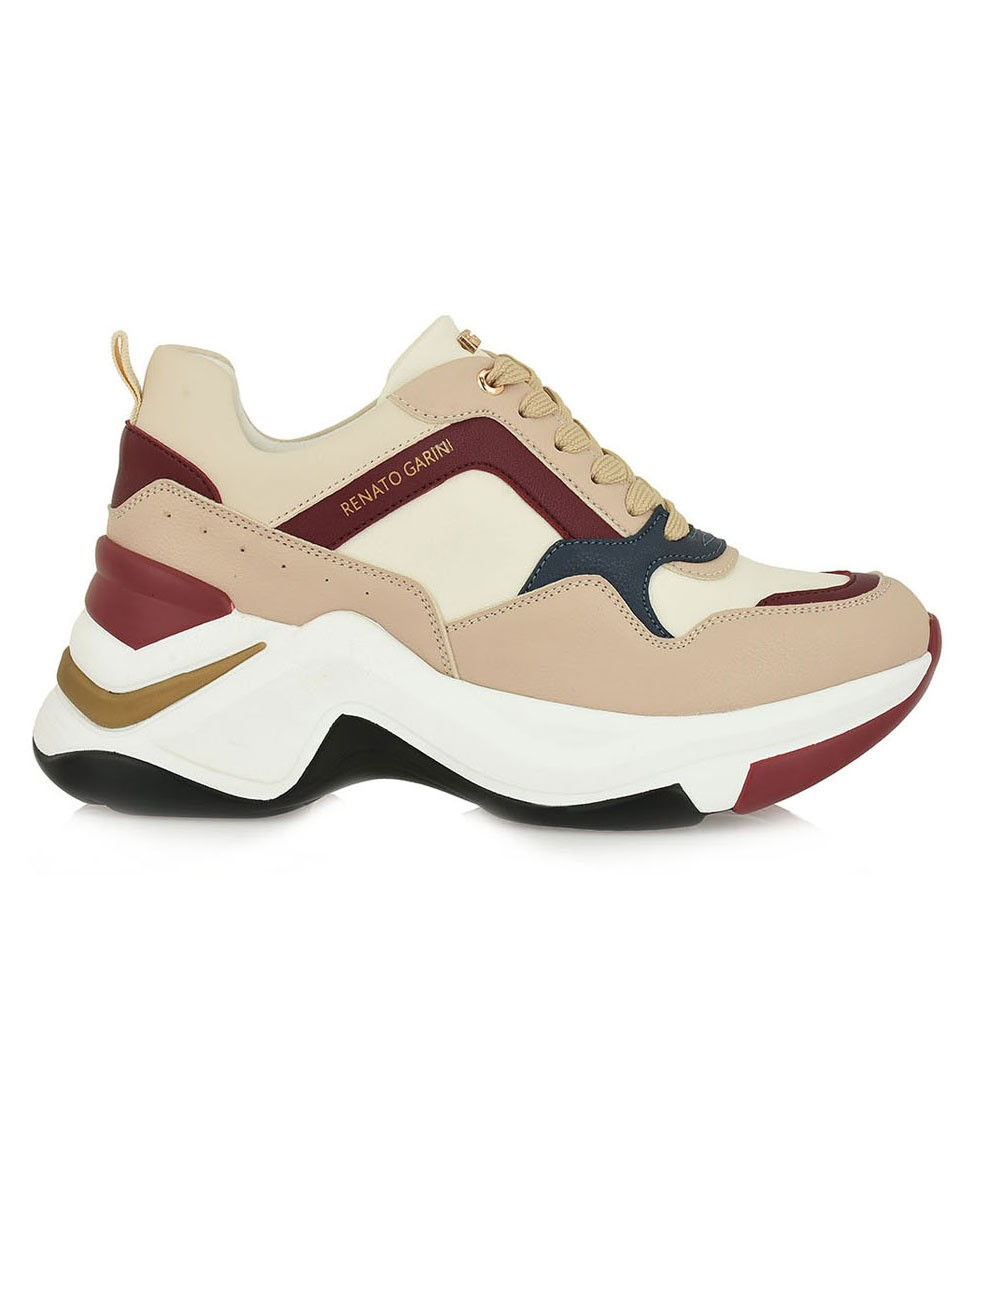 Renato Garini Γυναικεία Παπούτσια Sneakers 617-19R Nude Μπορντώ N119R6173P70